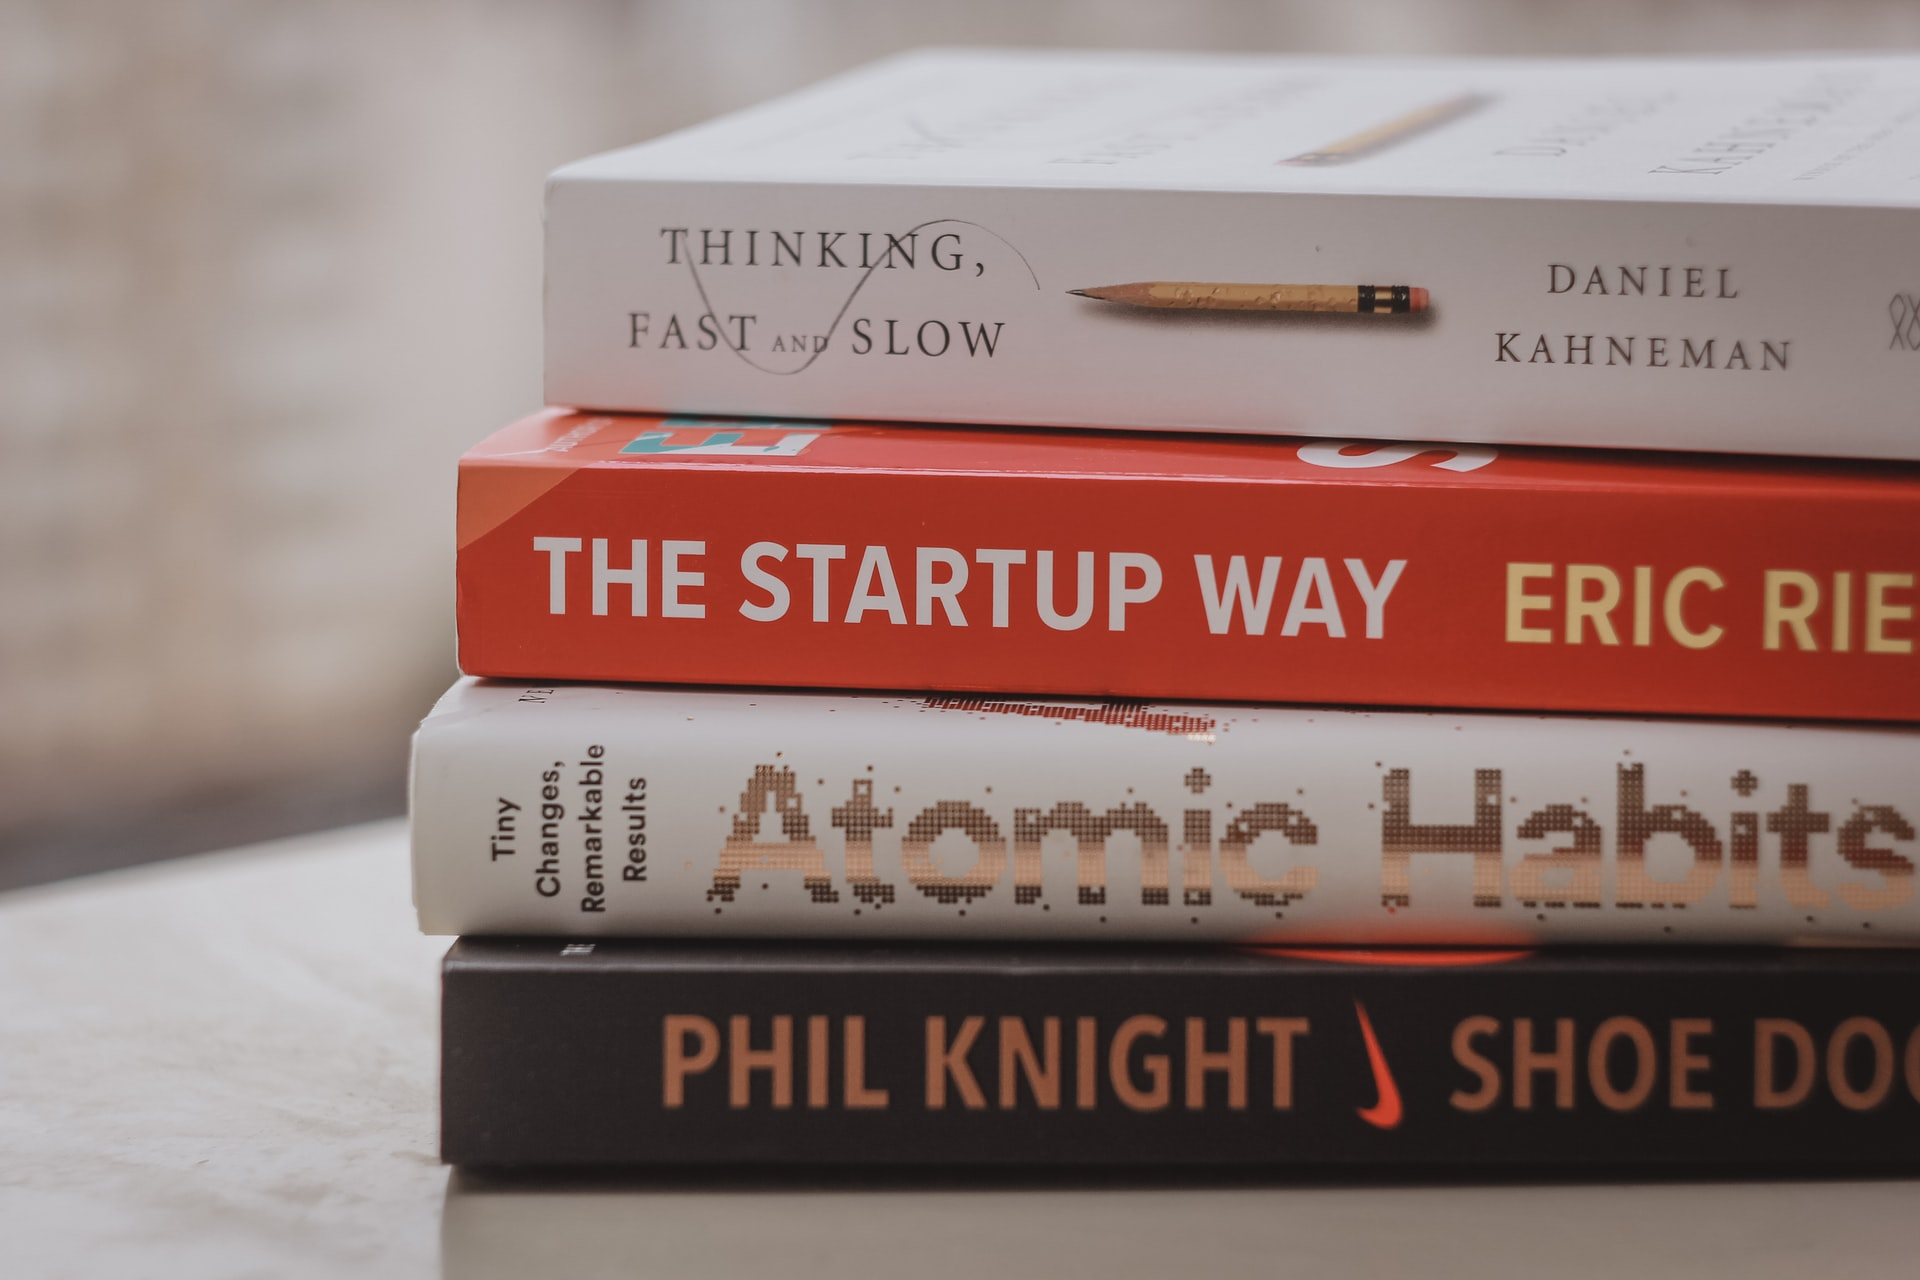 beste boeken over succesvolle ondernemers aanraders